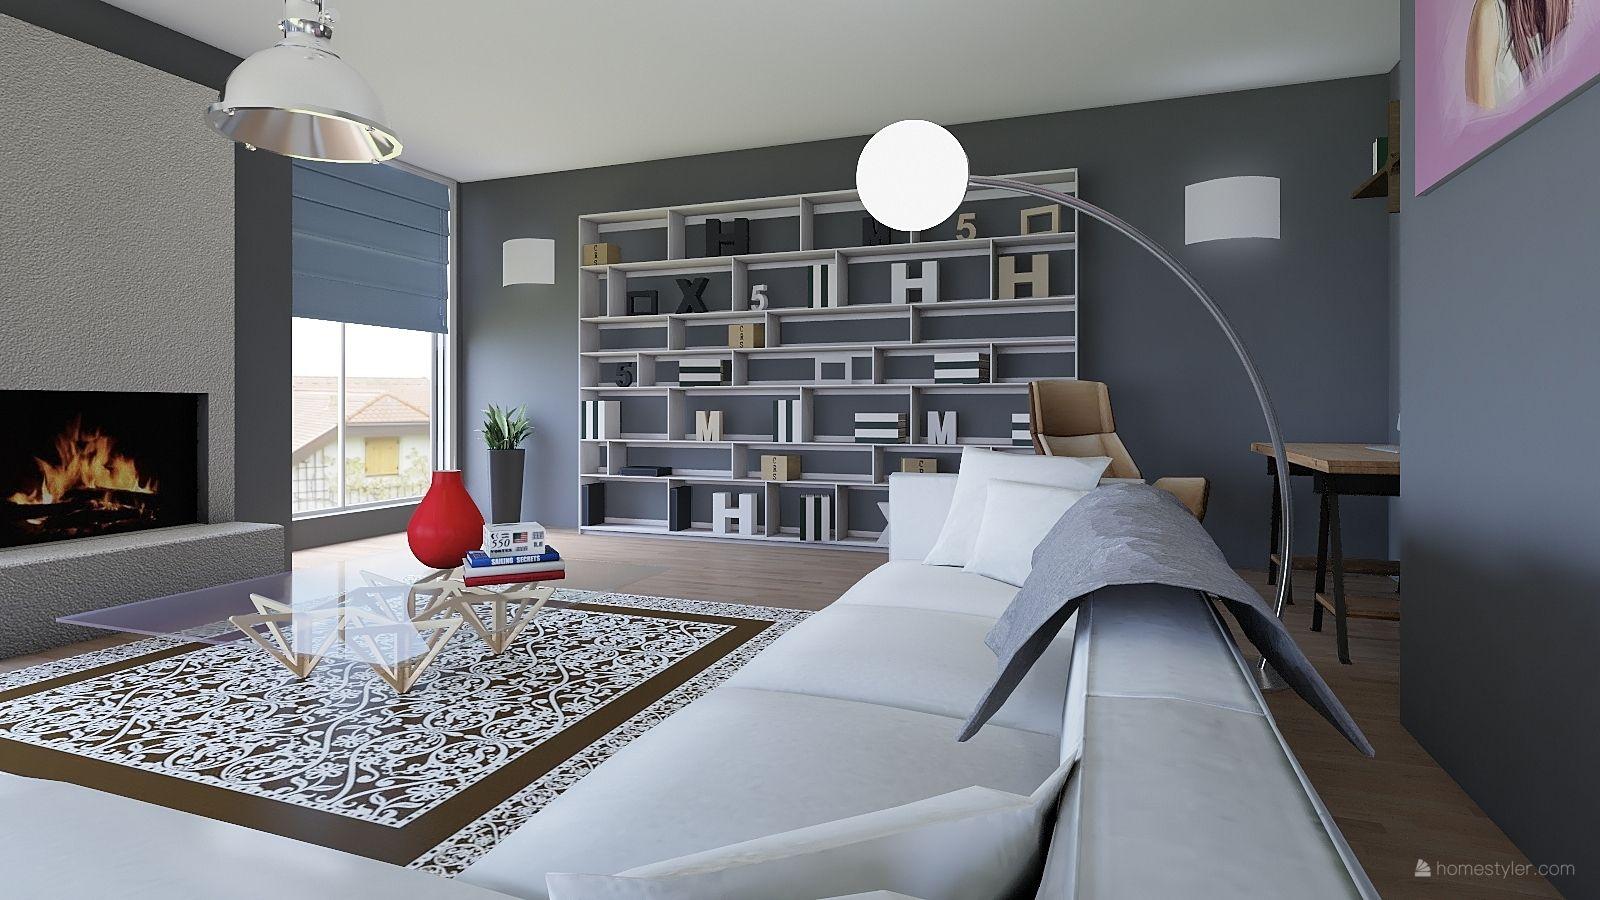 Living Room Decor By Chumafox Interiordesign Livingroom 3d Home Design Software 3d Home Design Interior Design Tools